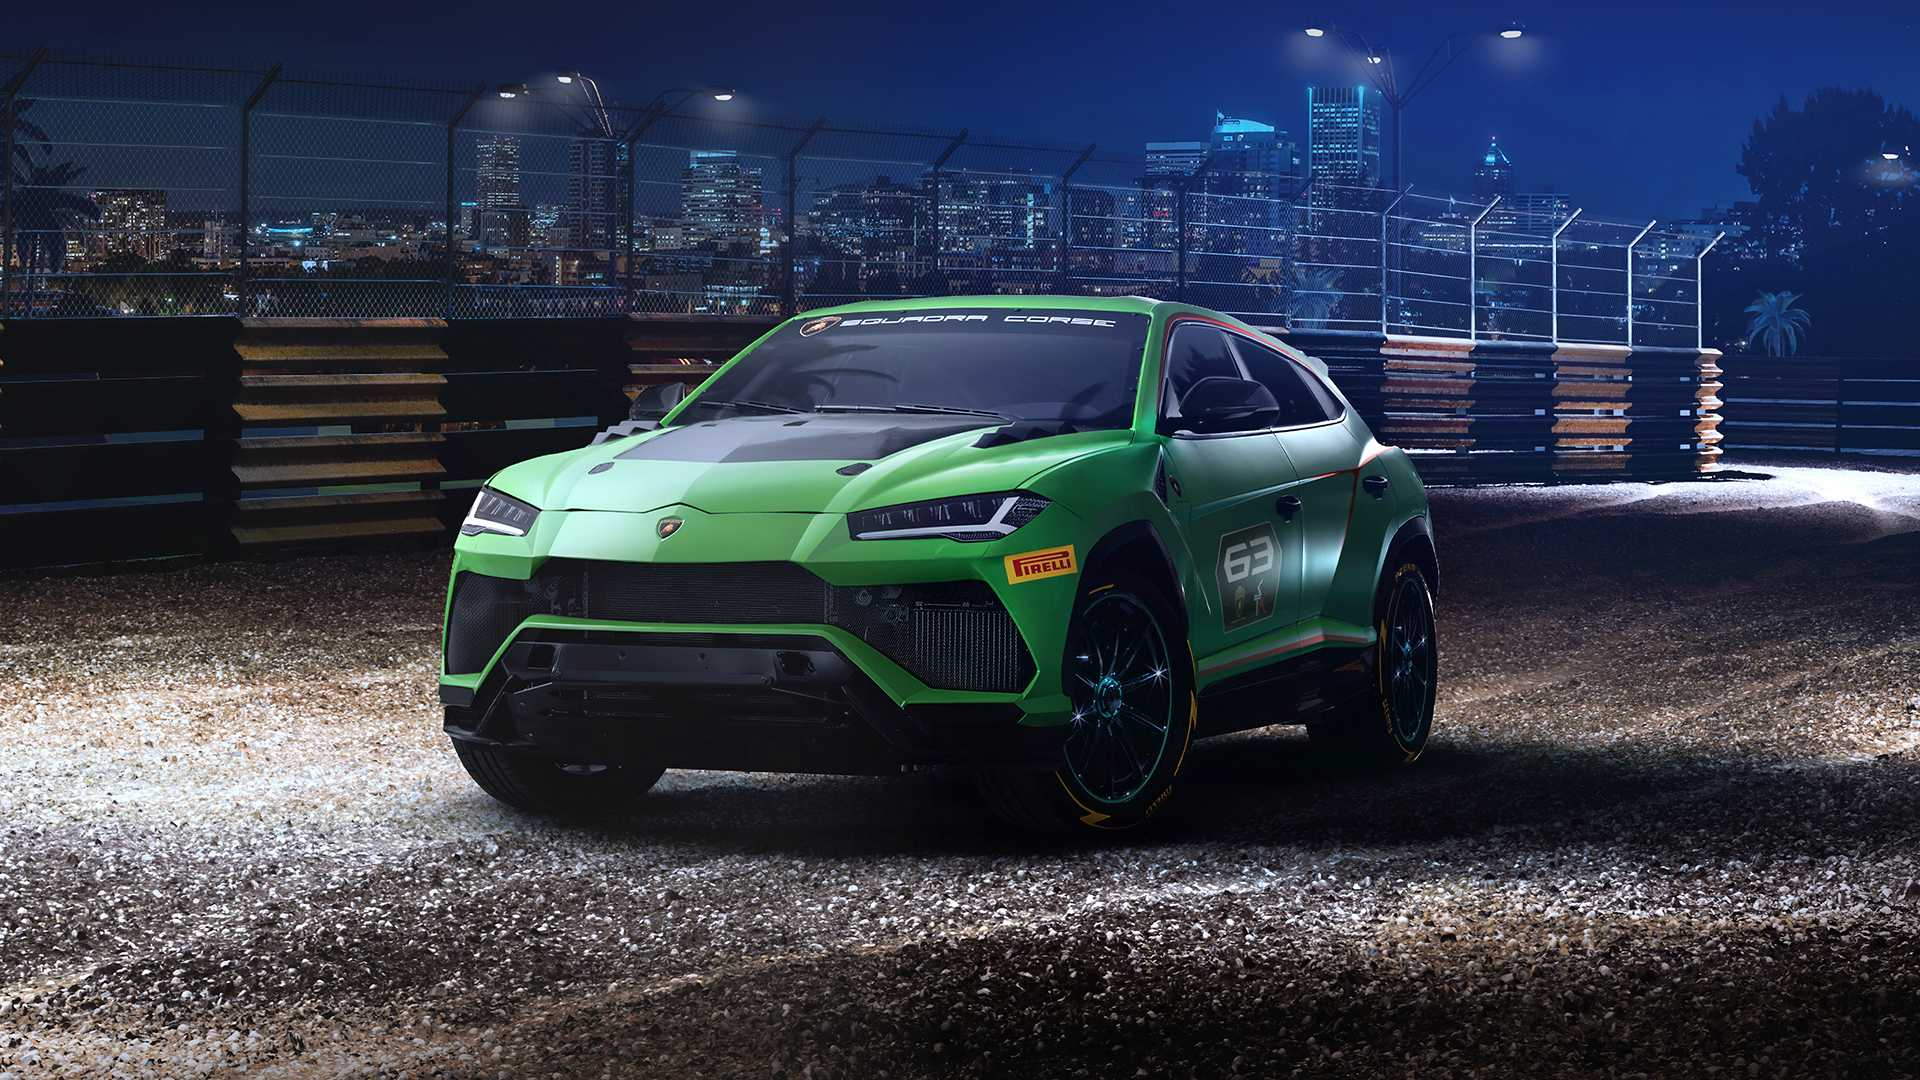 2018 - [Lamborghini] SUV Urus [LB 736] - Page 11 Lamborghini-urus-st-x